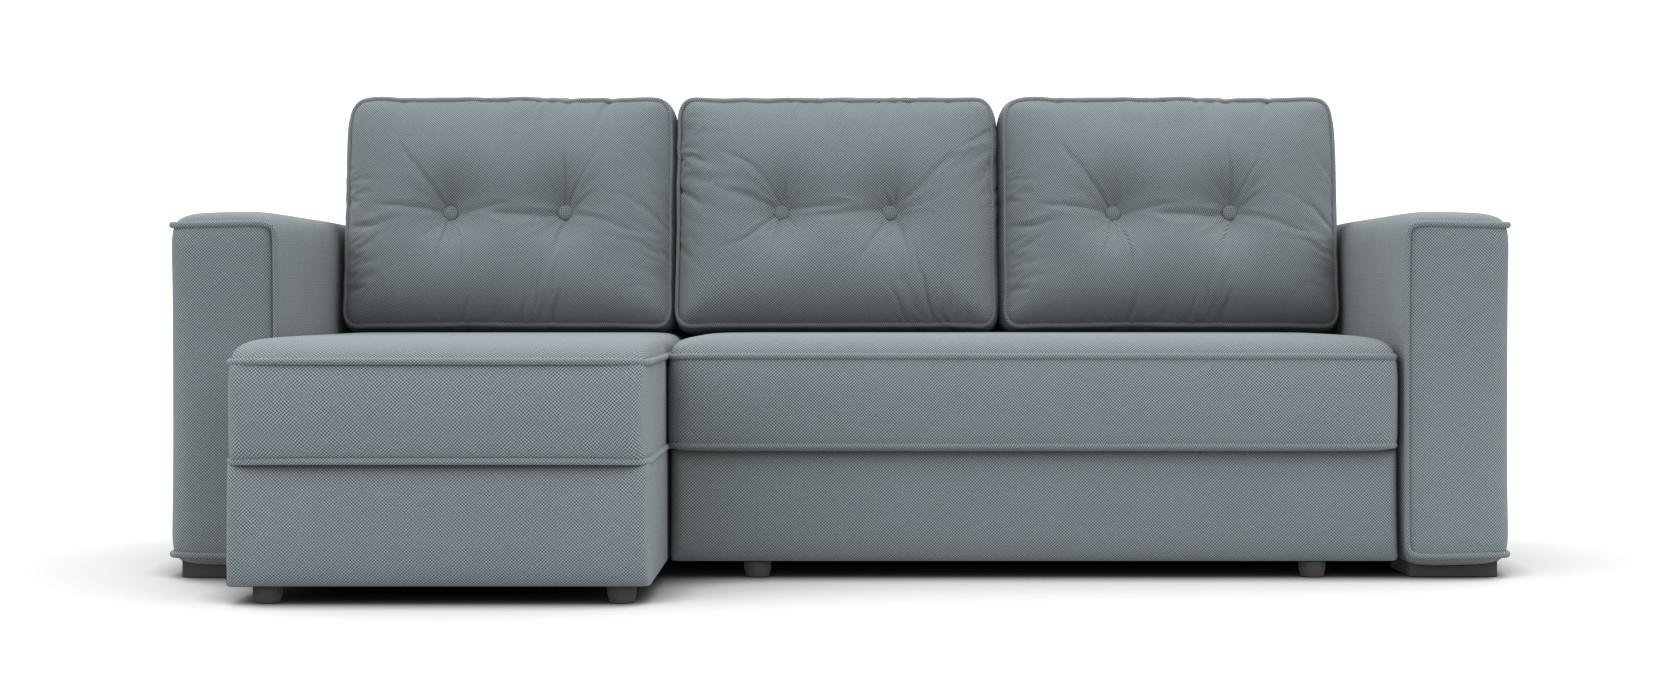 Угловой диван Silvio